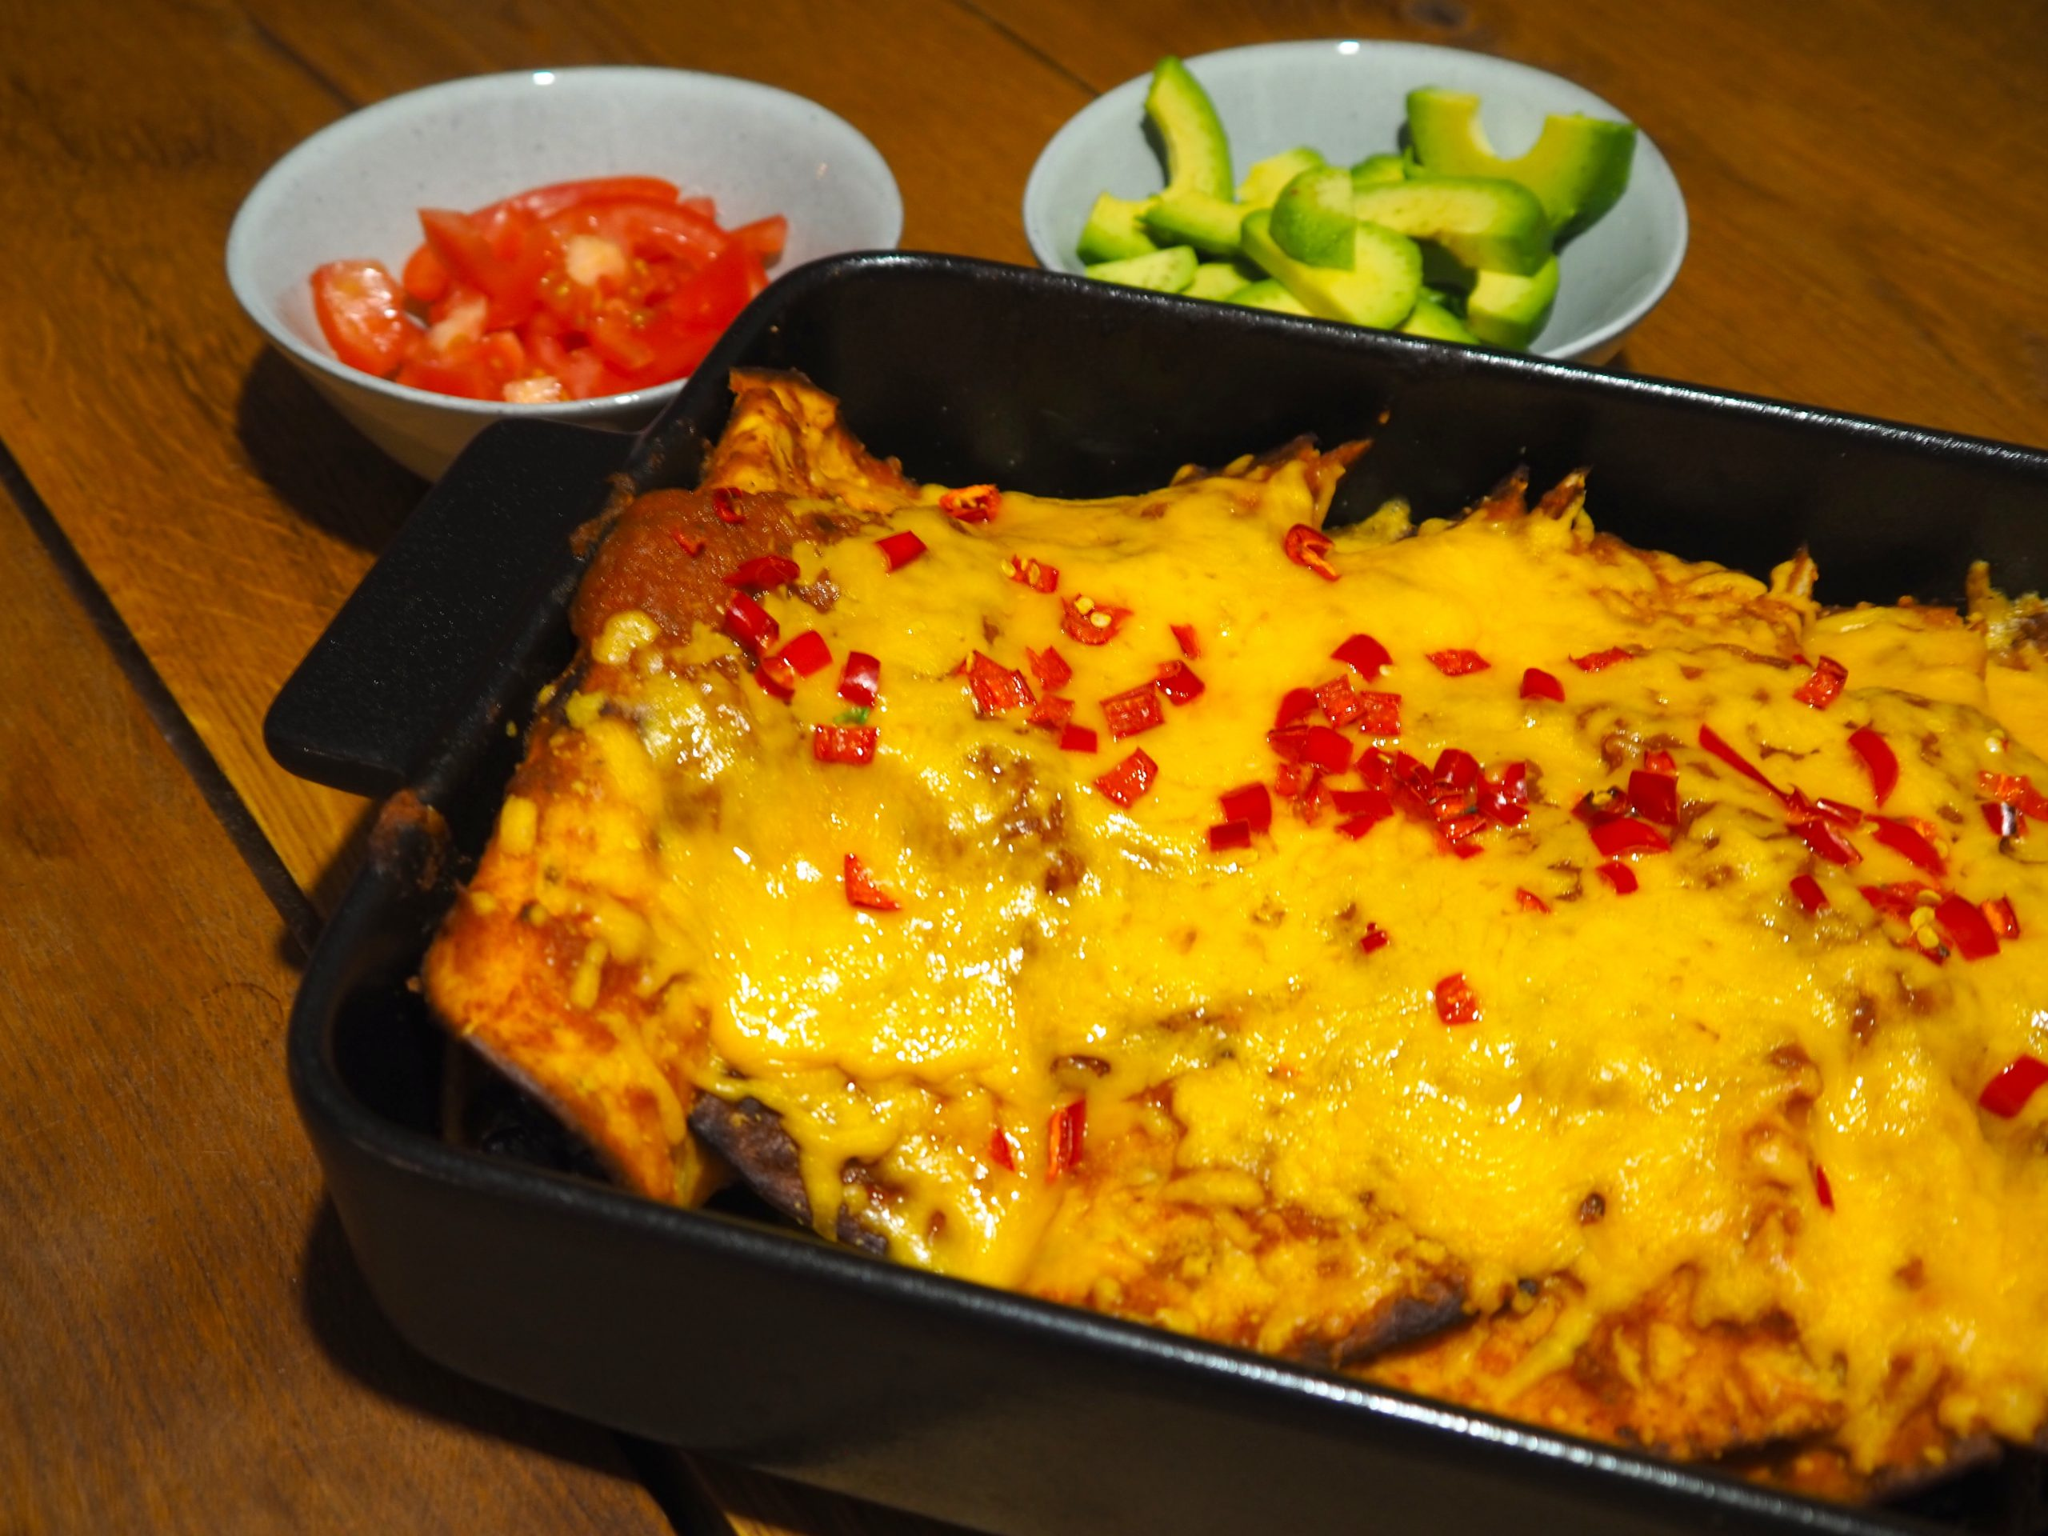 Enchilada's Rojas